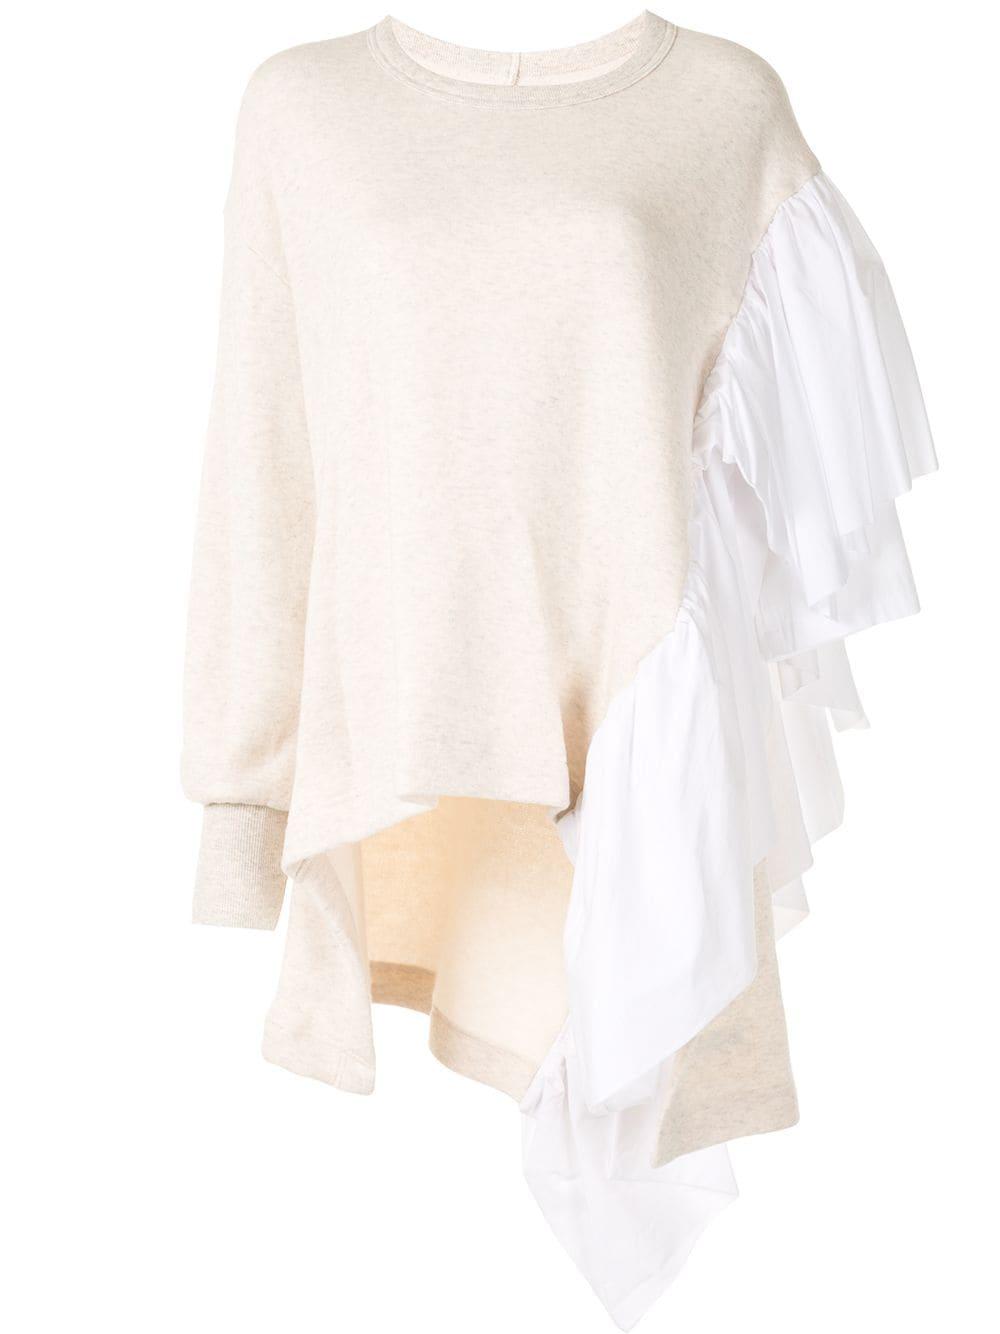 Yohji Yamamoto Pullover mit Rüschen - Nude